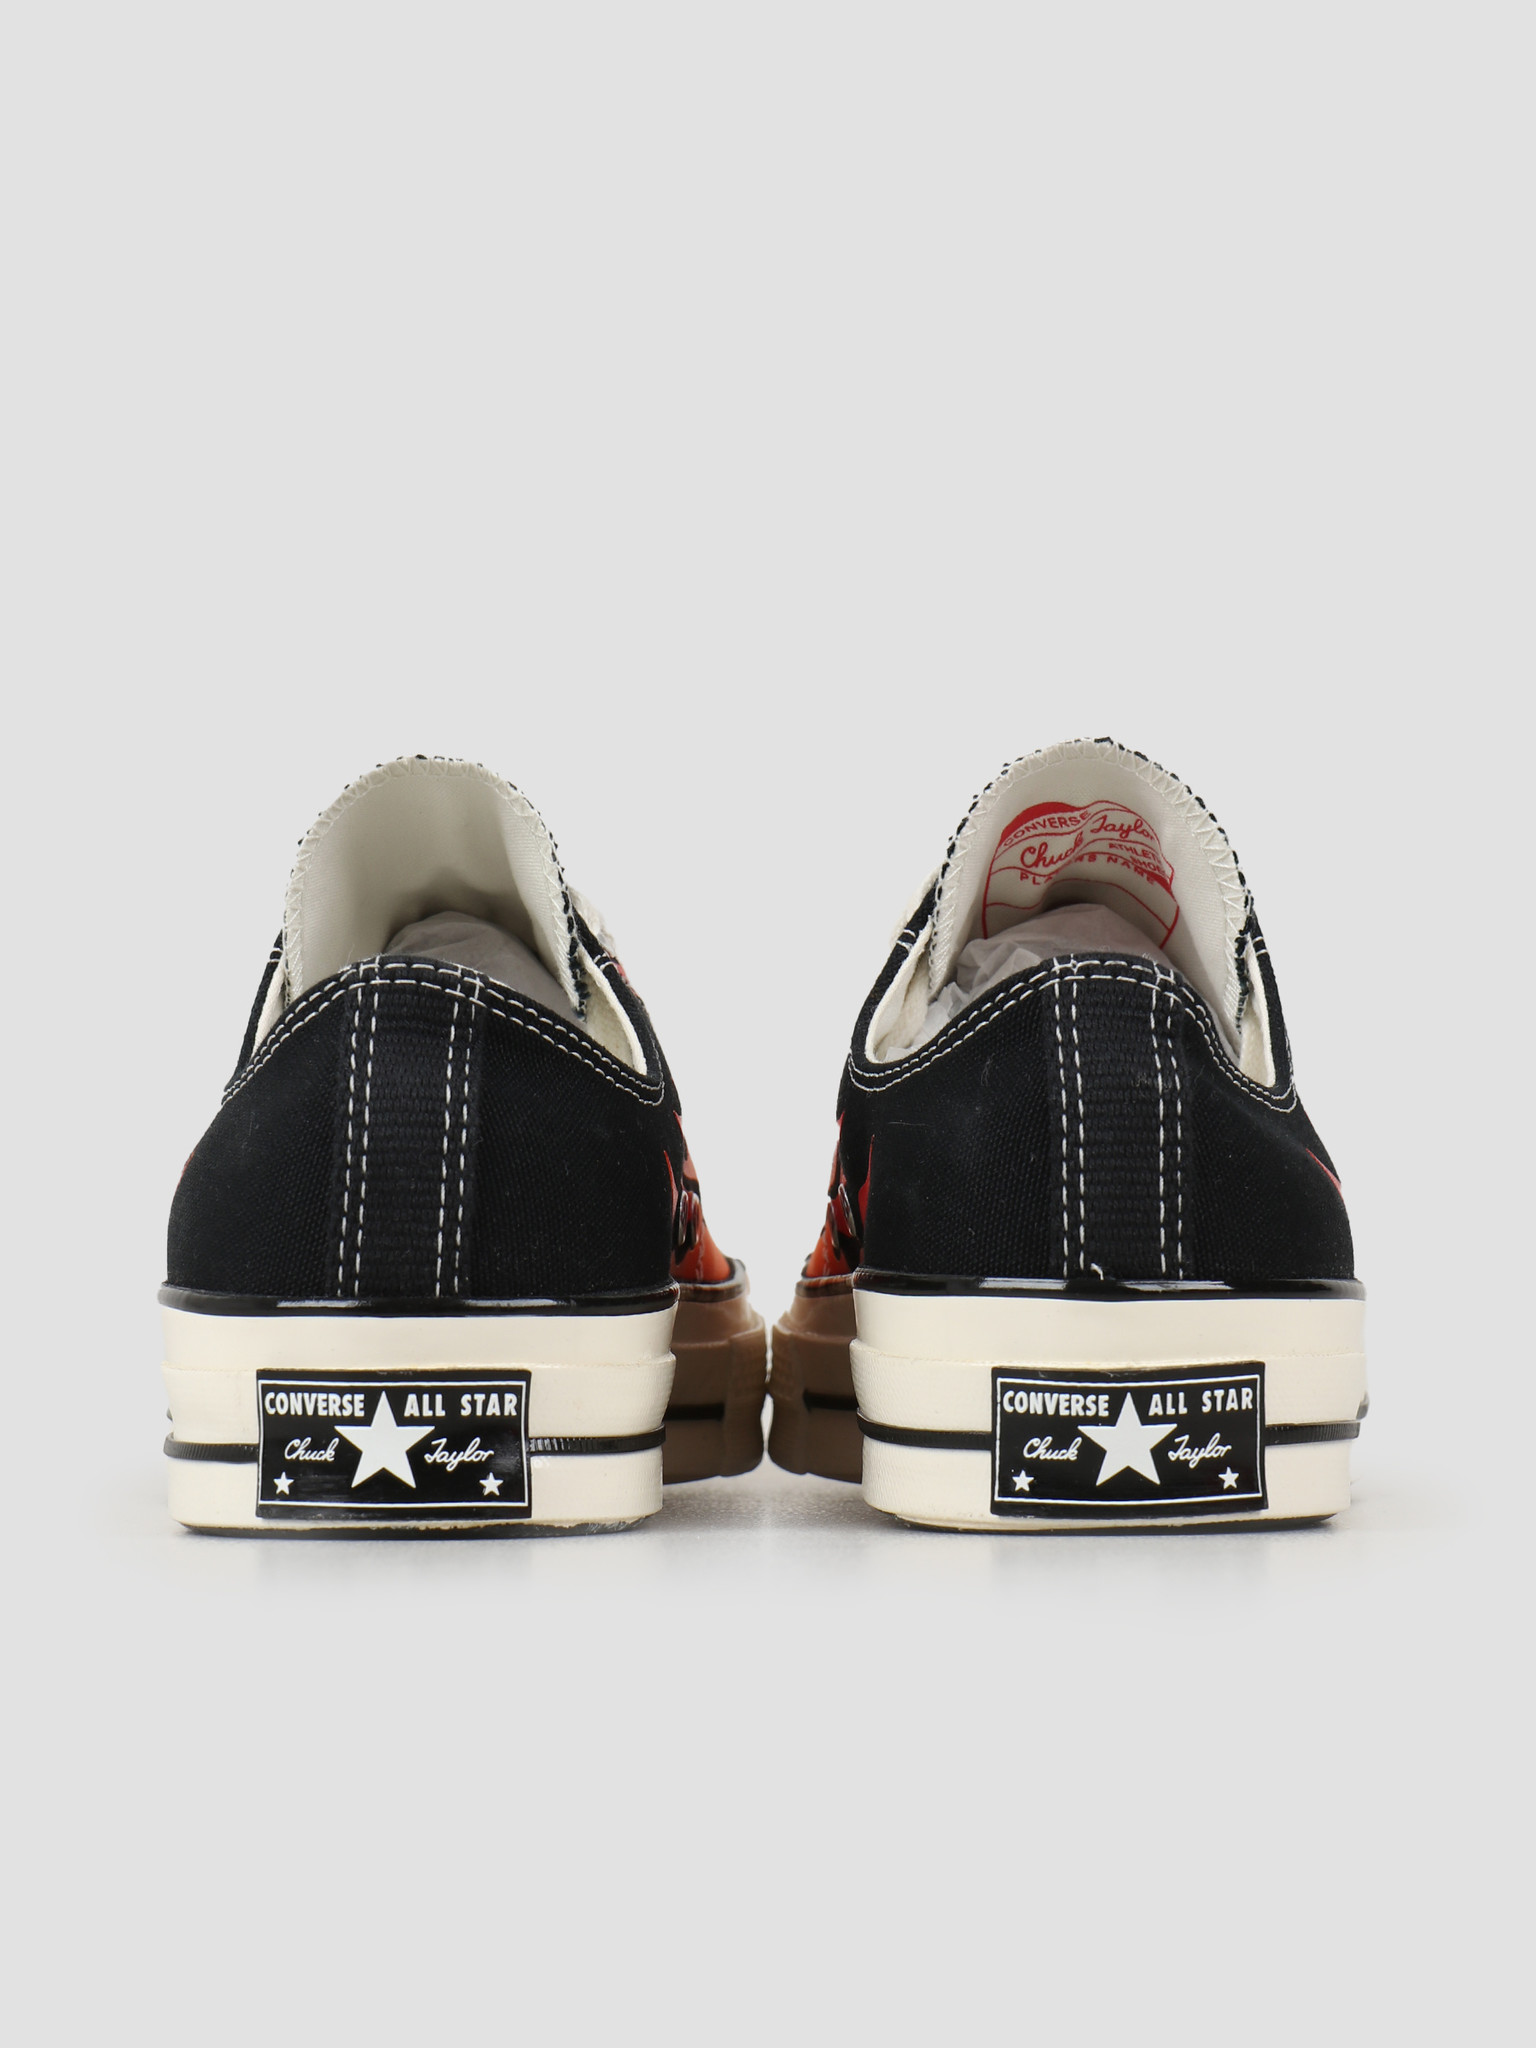 Converse Converse Chuck 70 Ox Black Enamel Red Egret 167813C